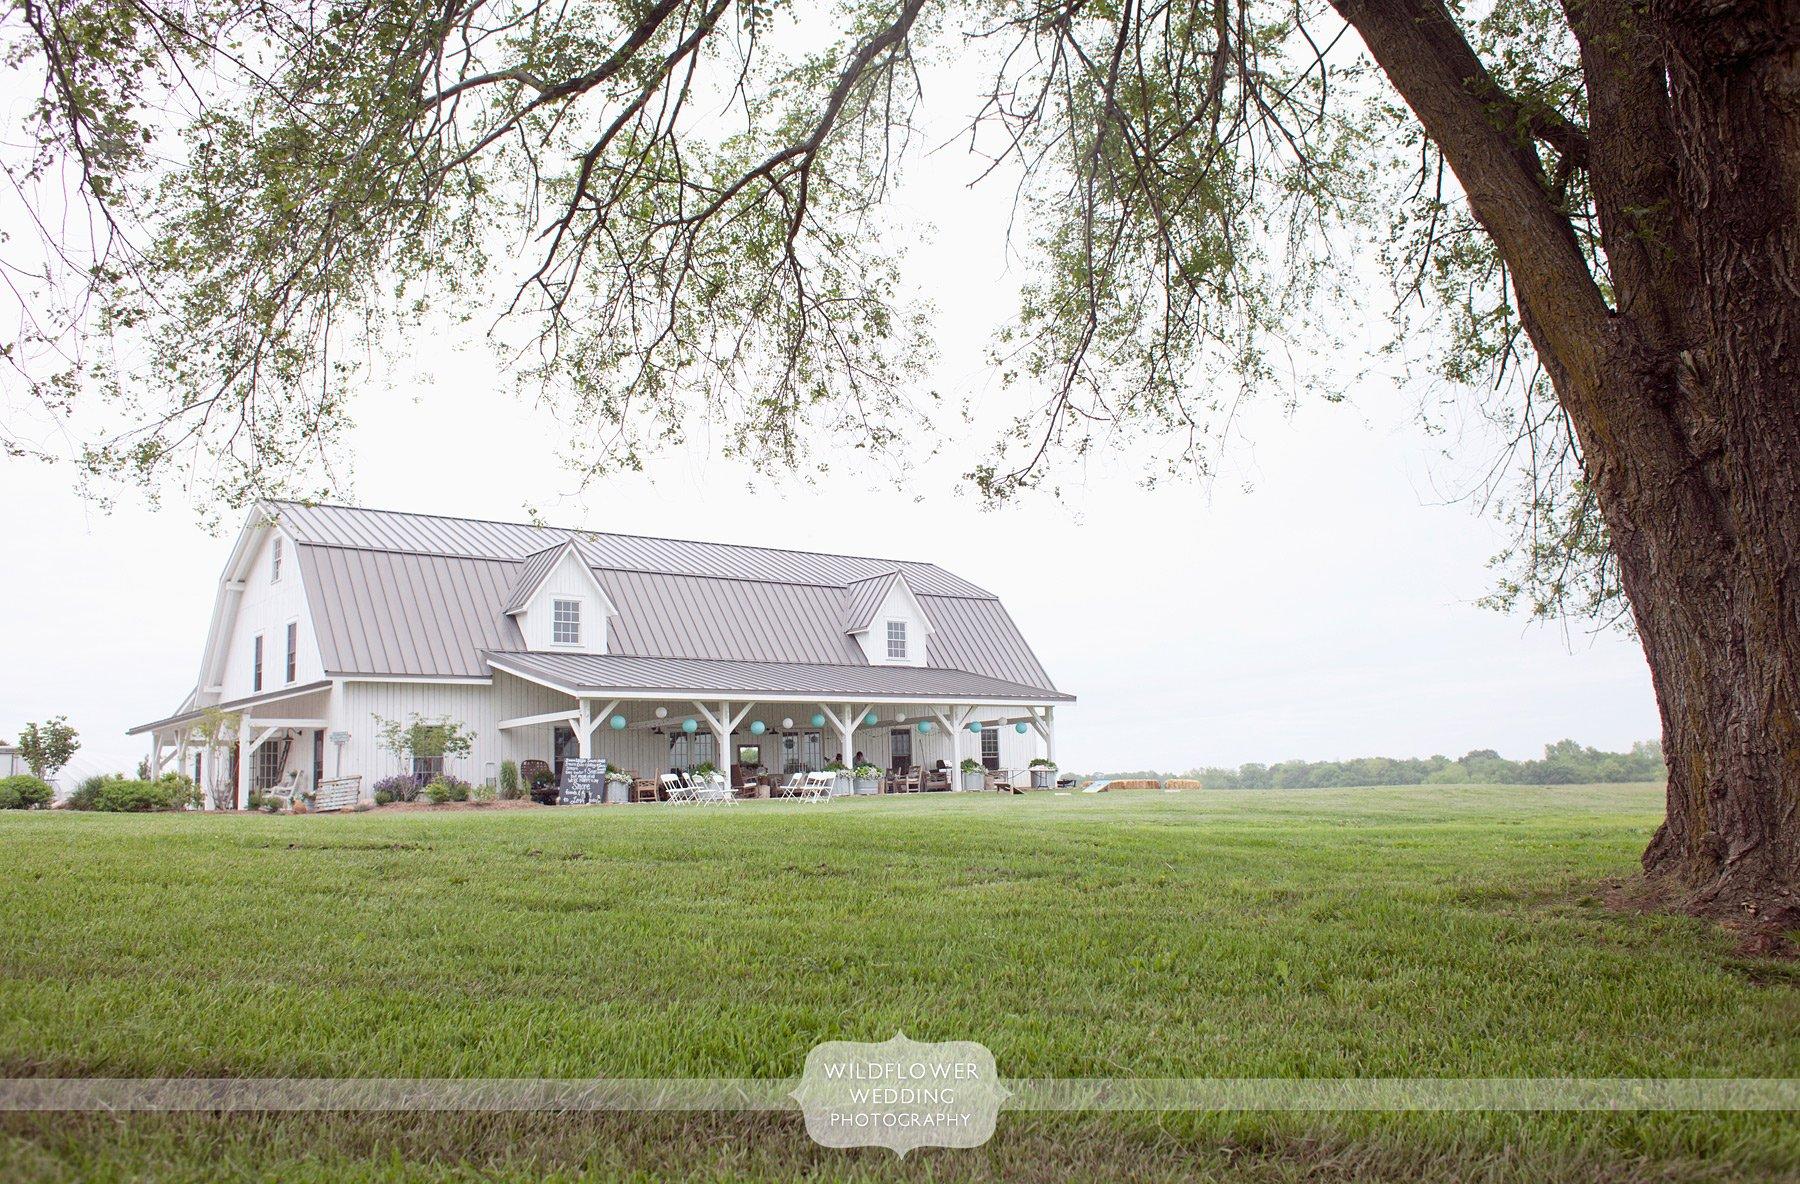 Outdoor Barn Wedding near Columbia, MO - Blue Bell Farm